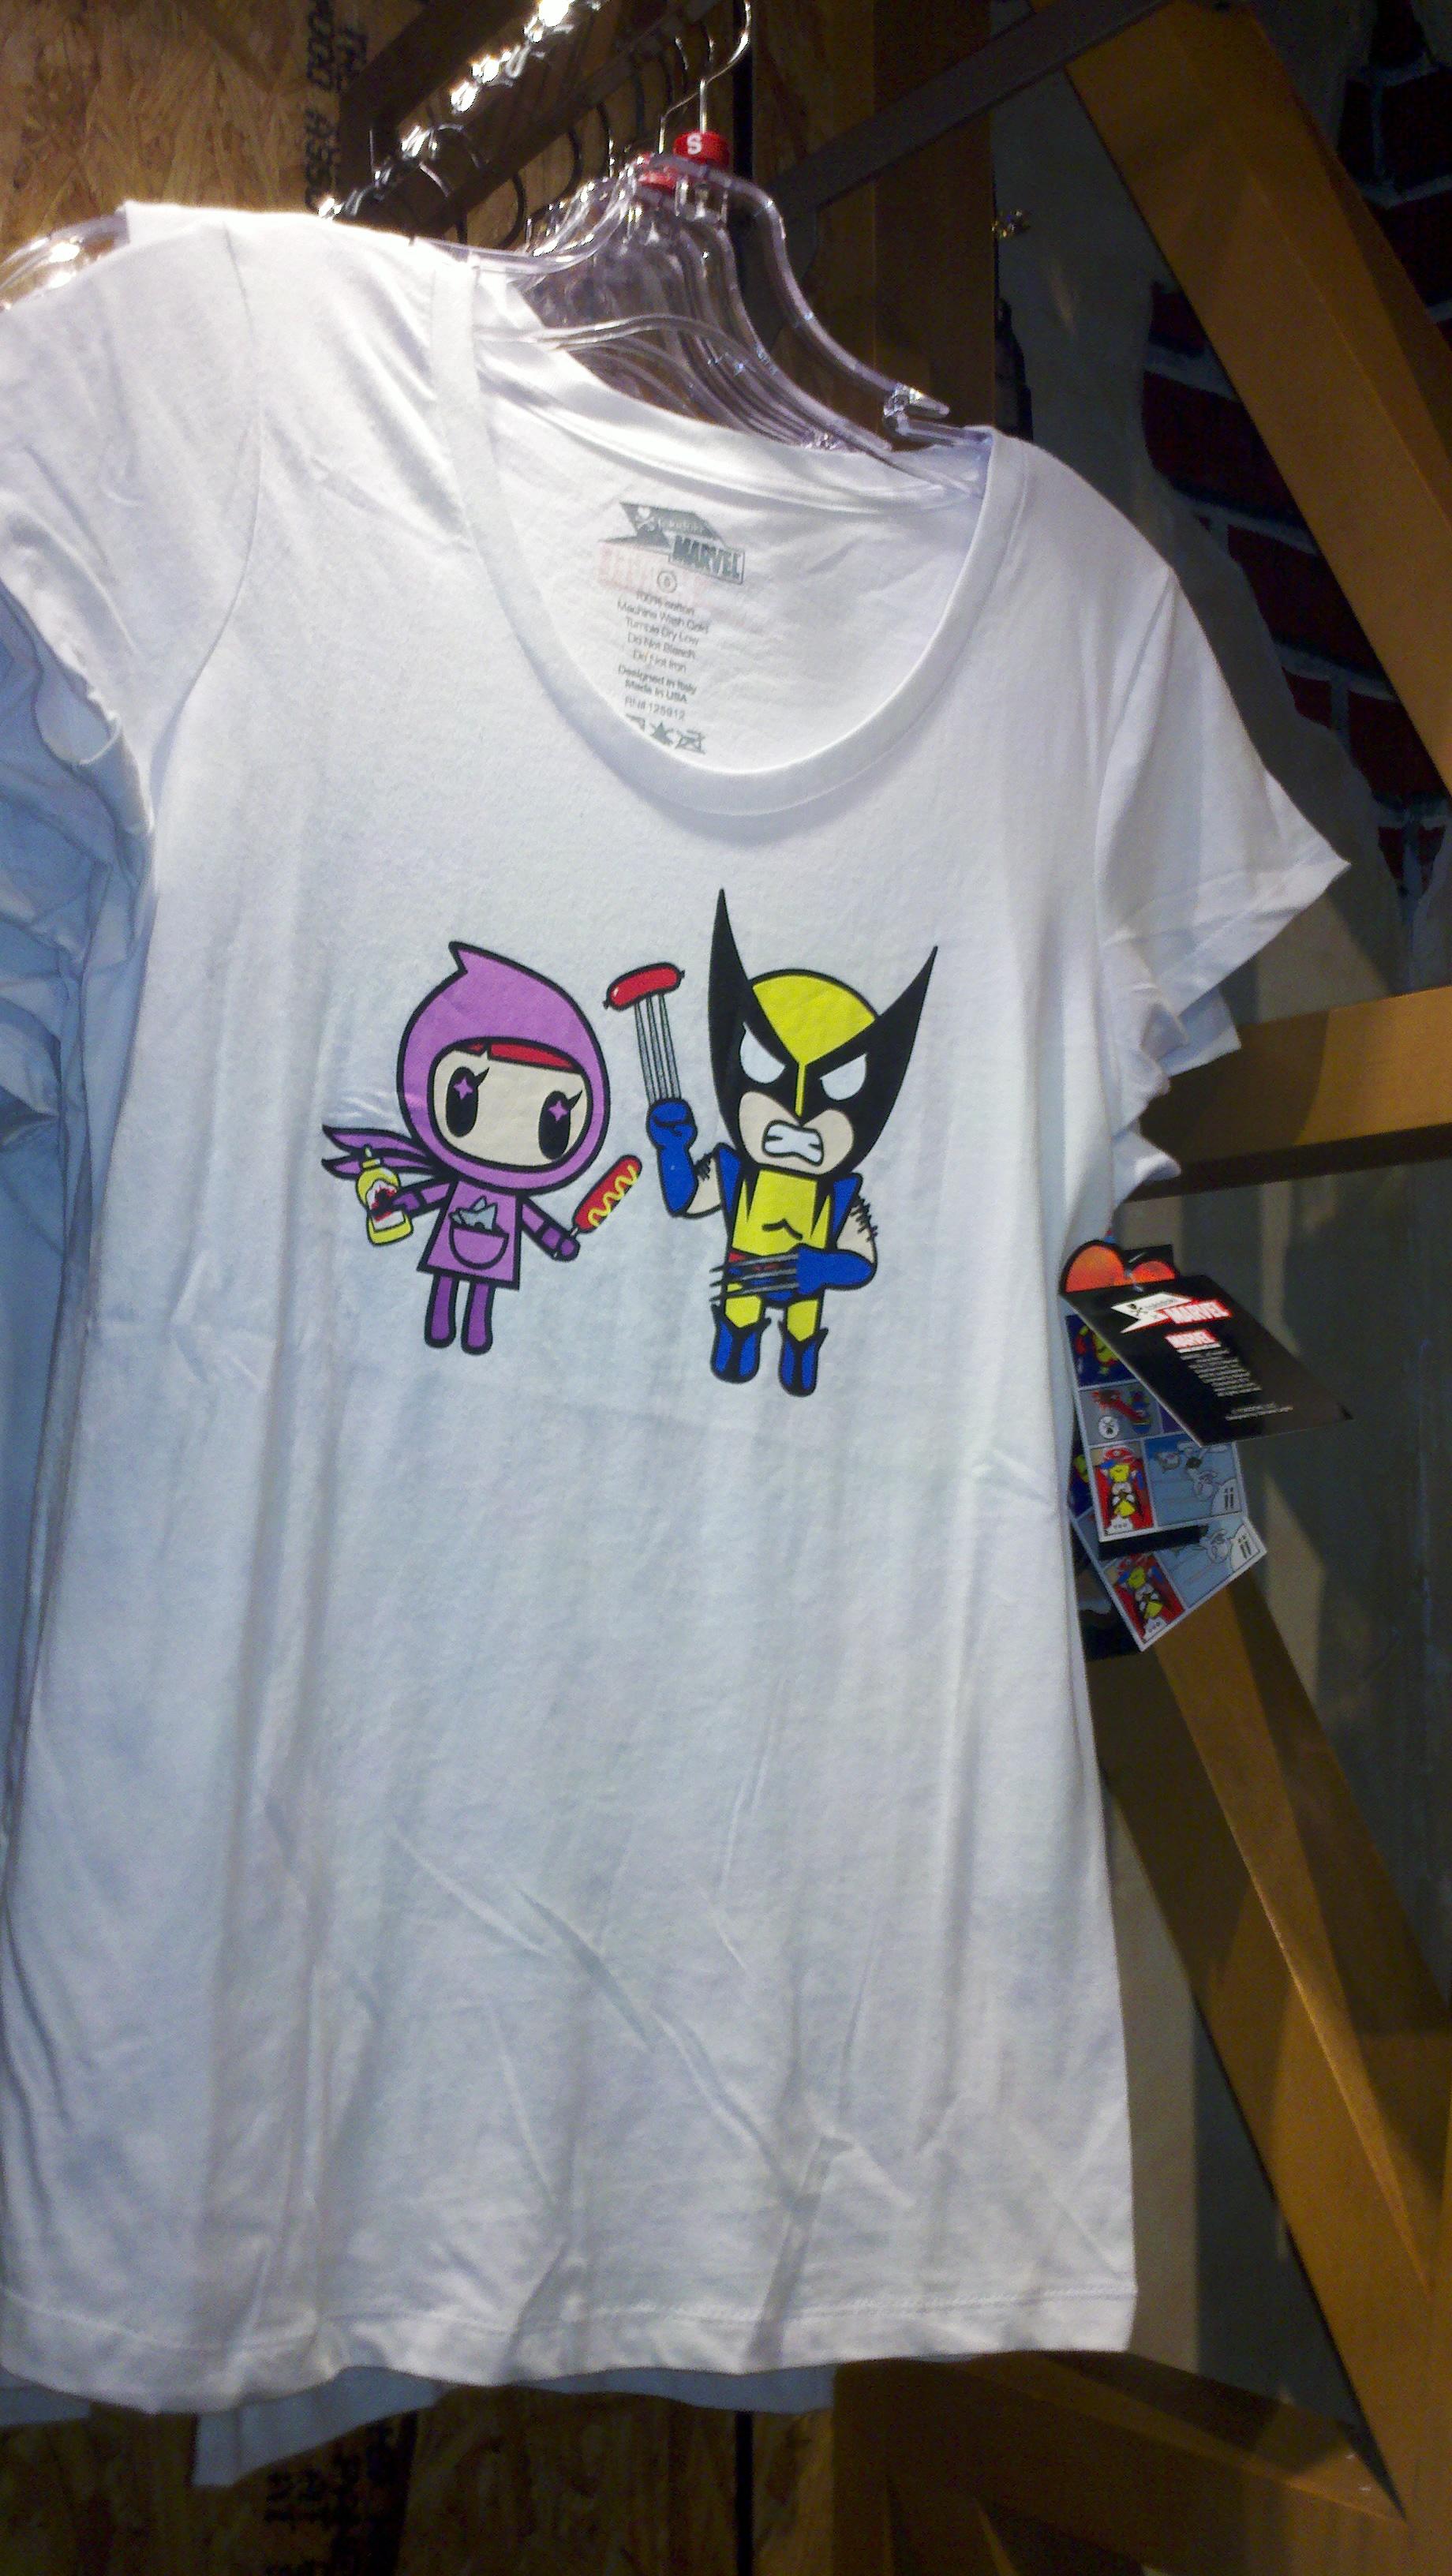 NEW! Tokidoki Meets Marvel T-Shirts at Walt Disney World